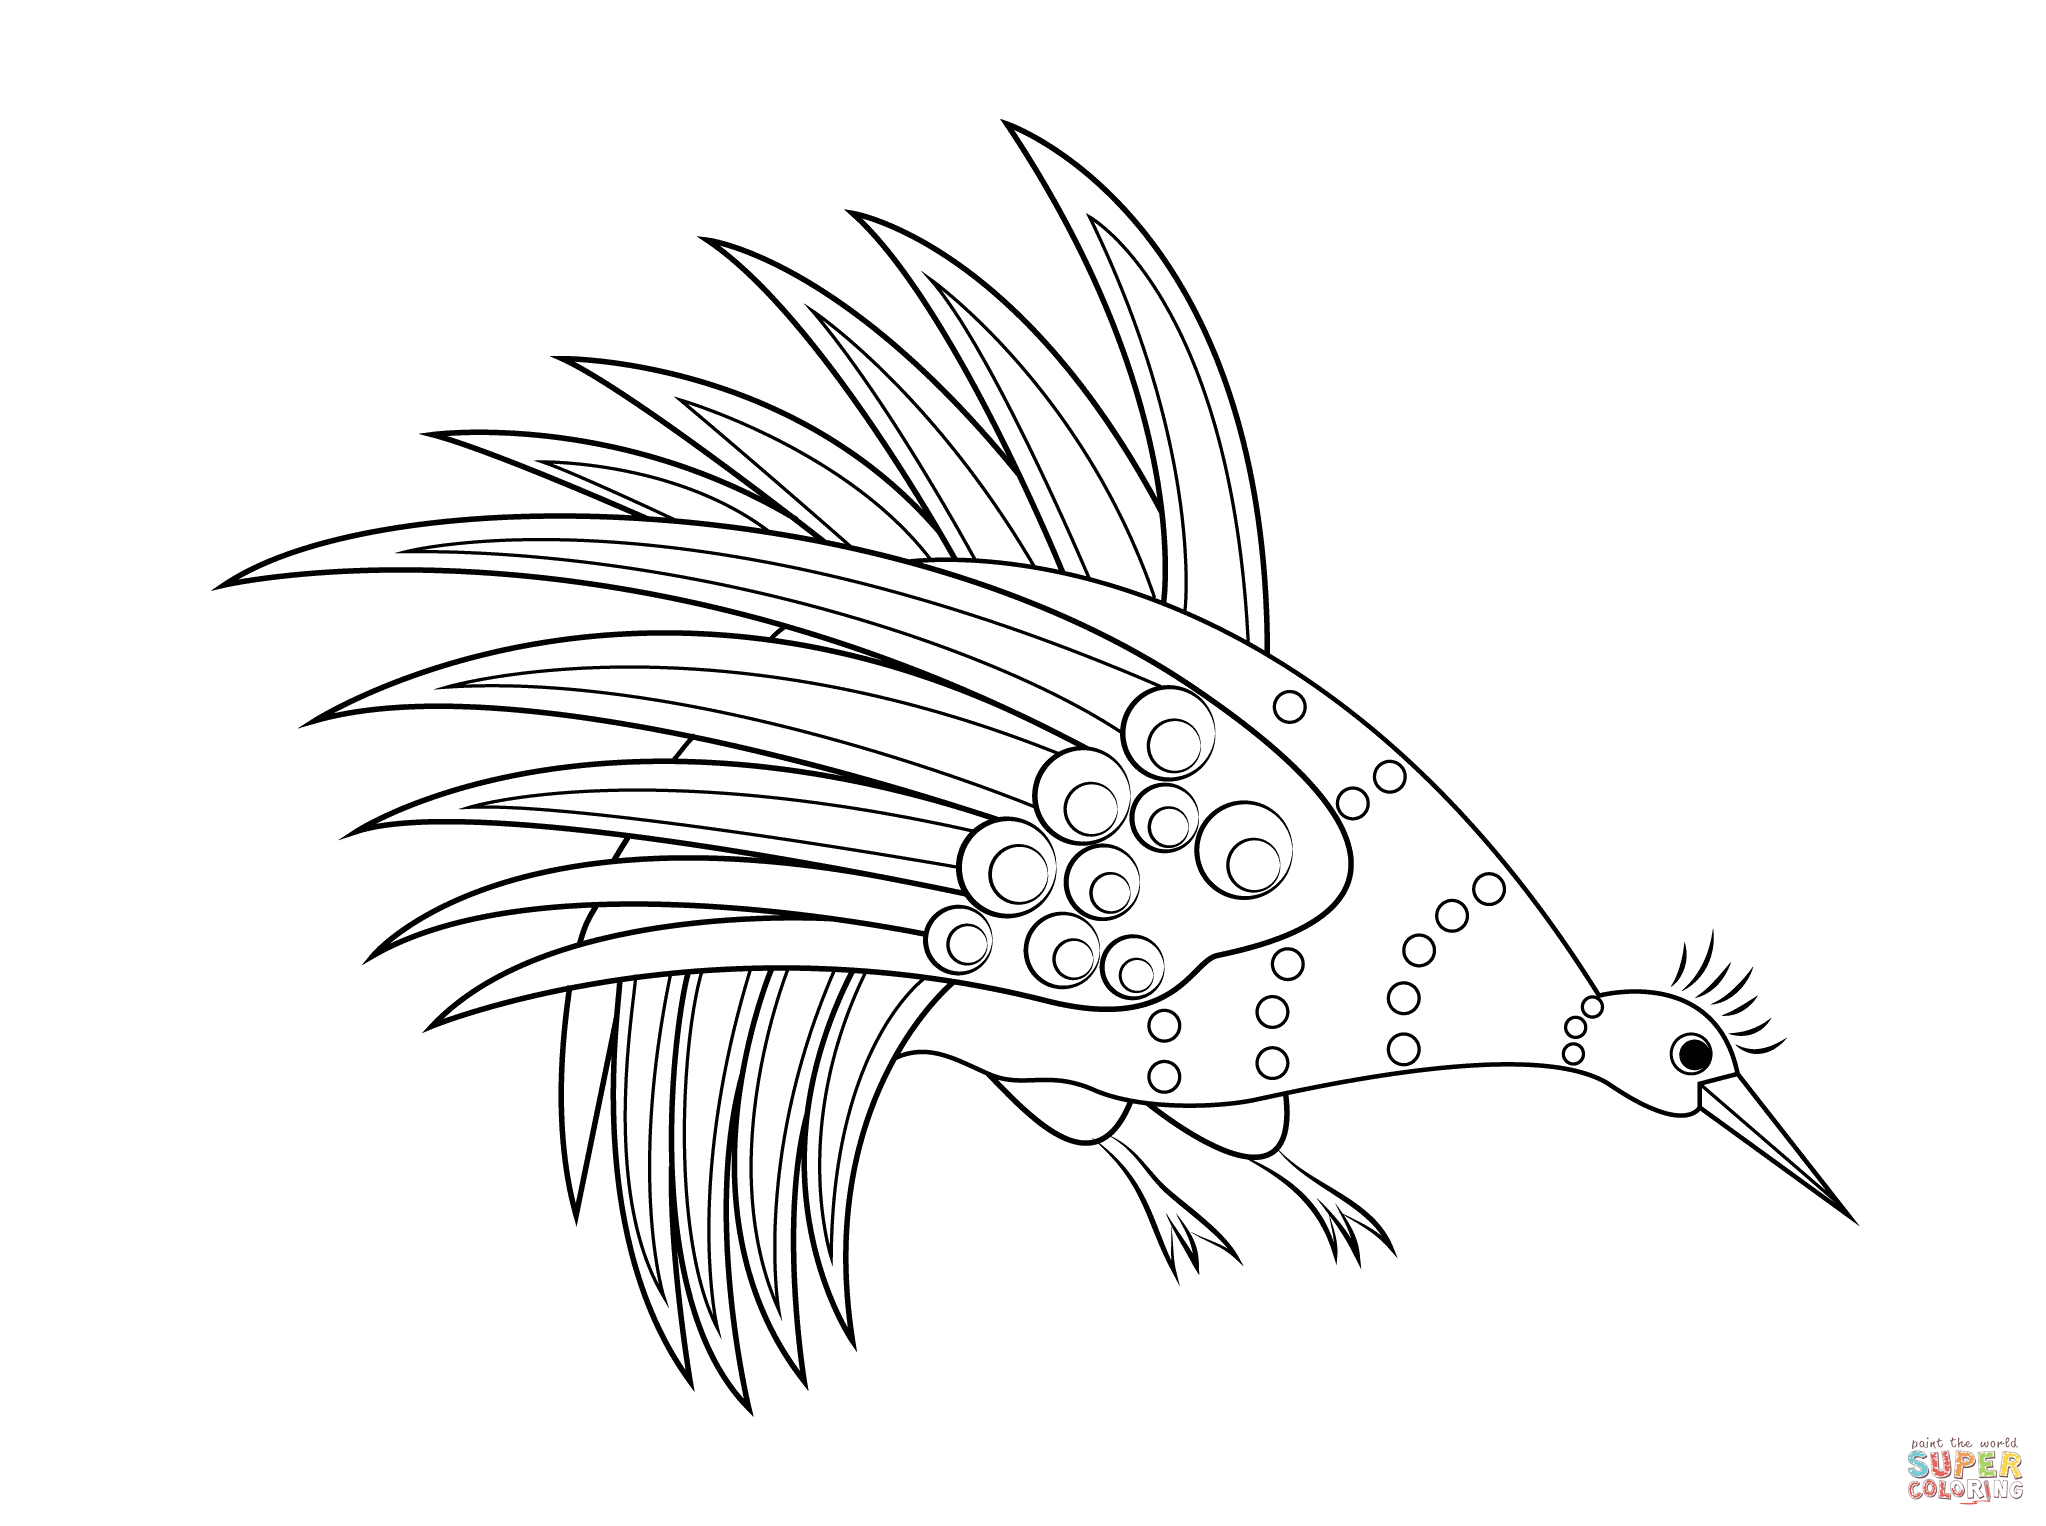 Rainbow Bowerbird Aboriginal Art Coloring Page